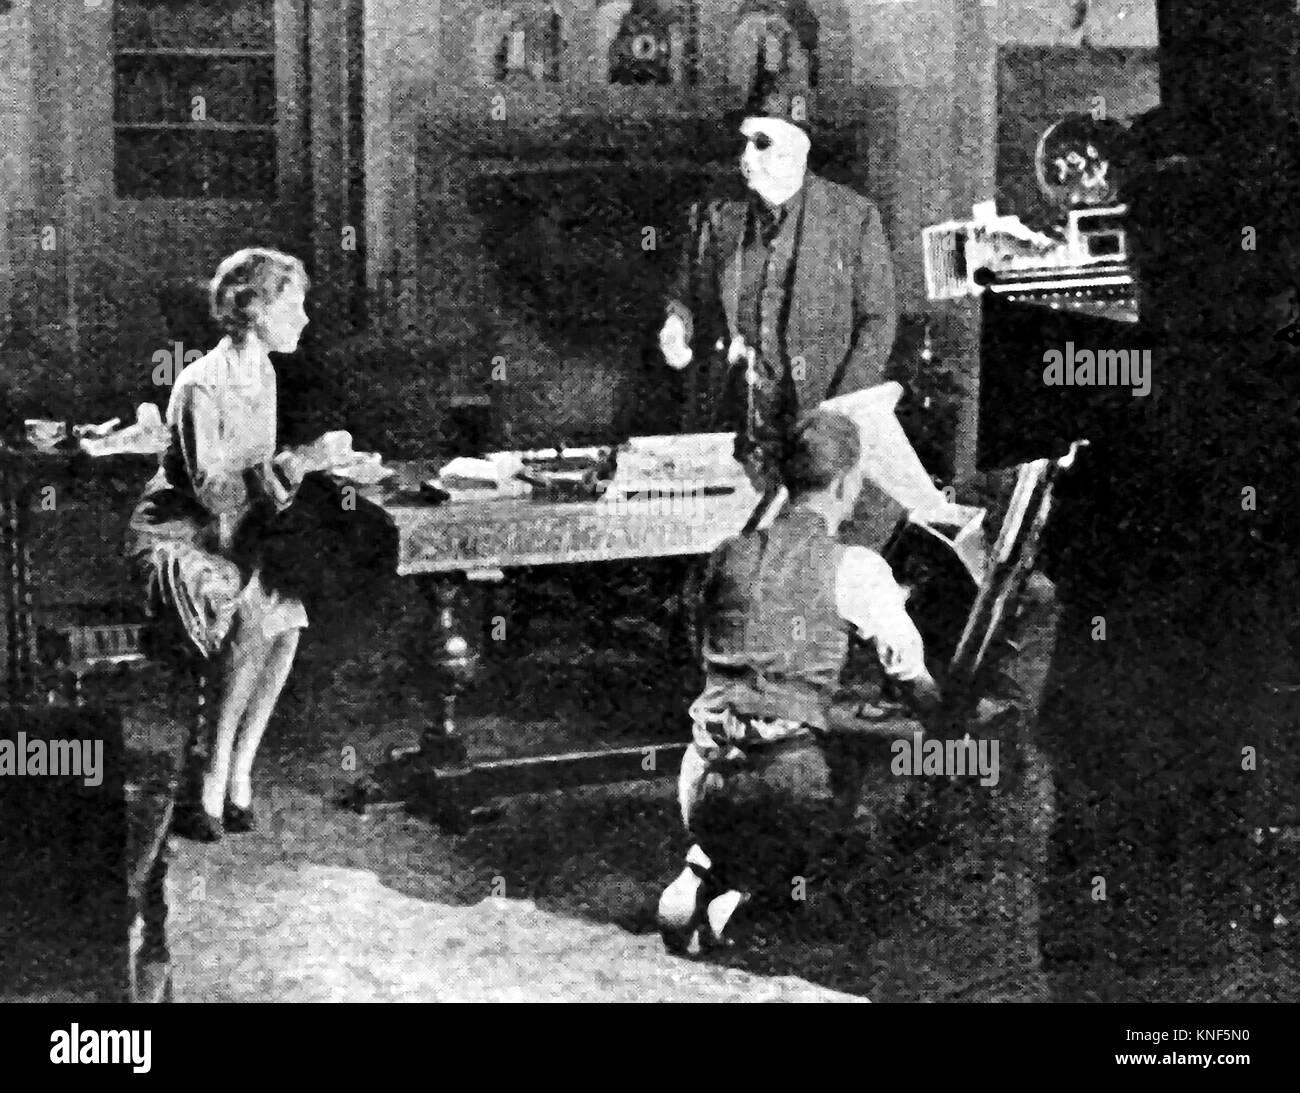 Eine Szene auf Elstree Film Studios, England in den 40er Jahren - Richard Horatio Edgar Wallace, Schriftsteller Stockbild